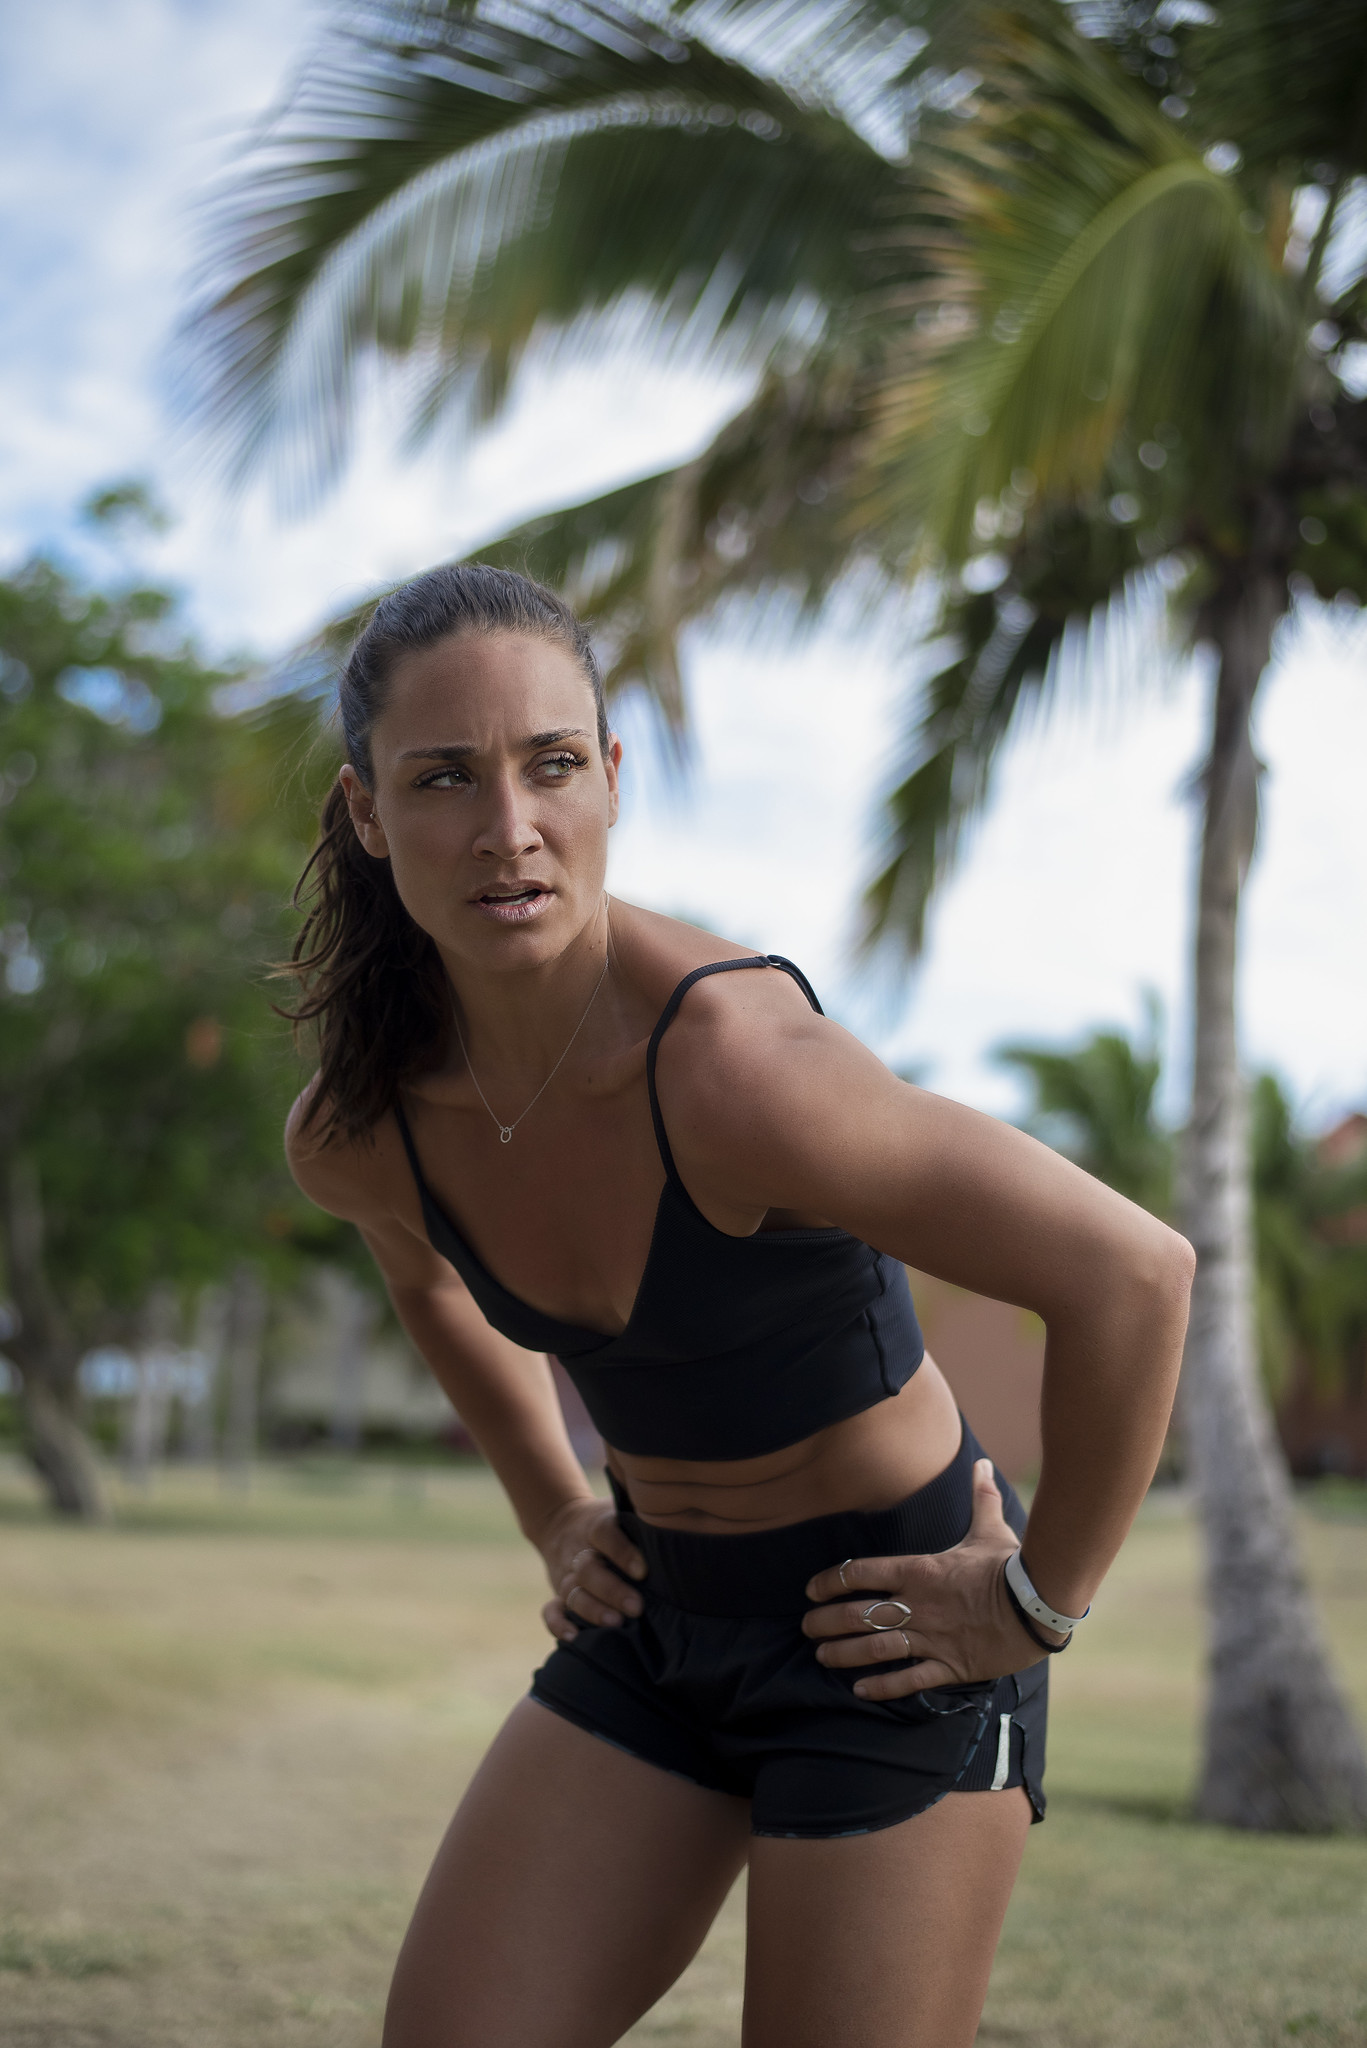 Camille DG, course au soleil, juin 2019, lookbook 1